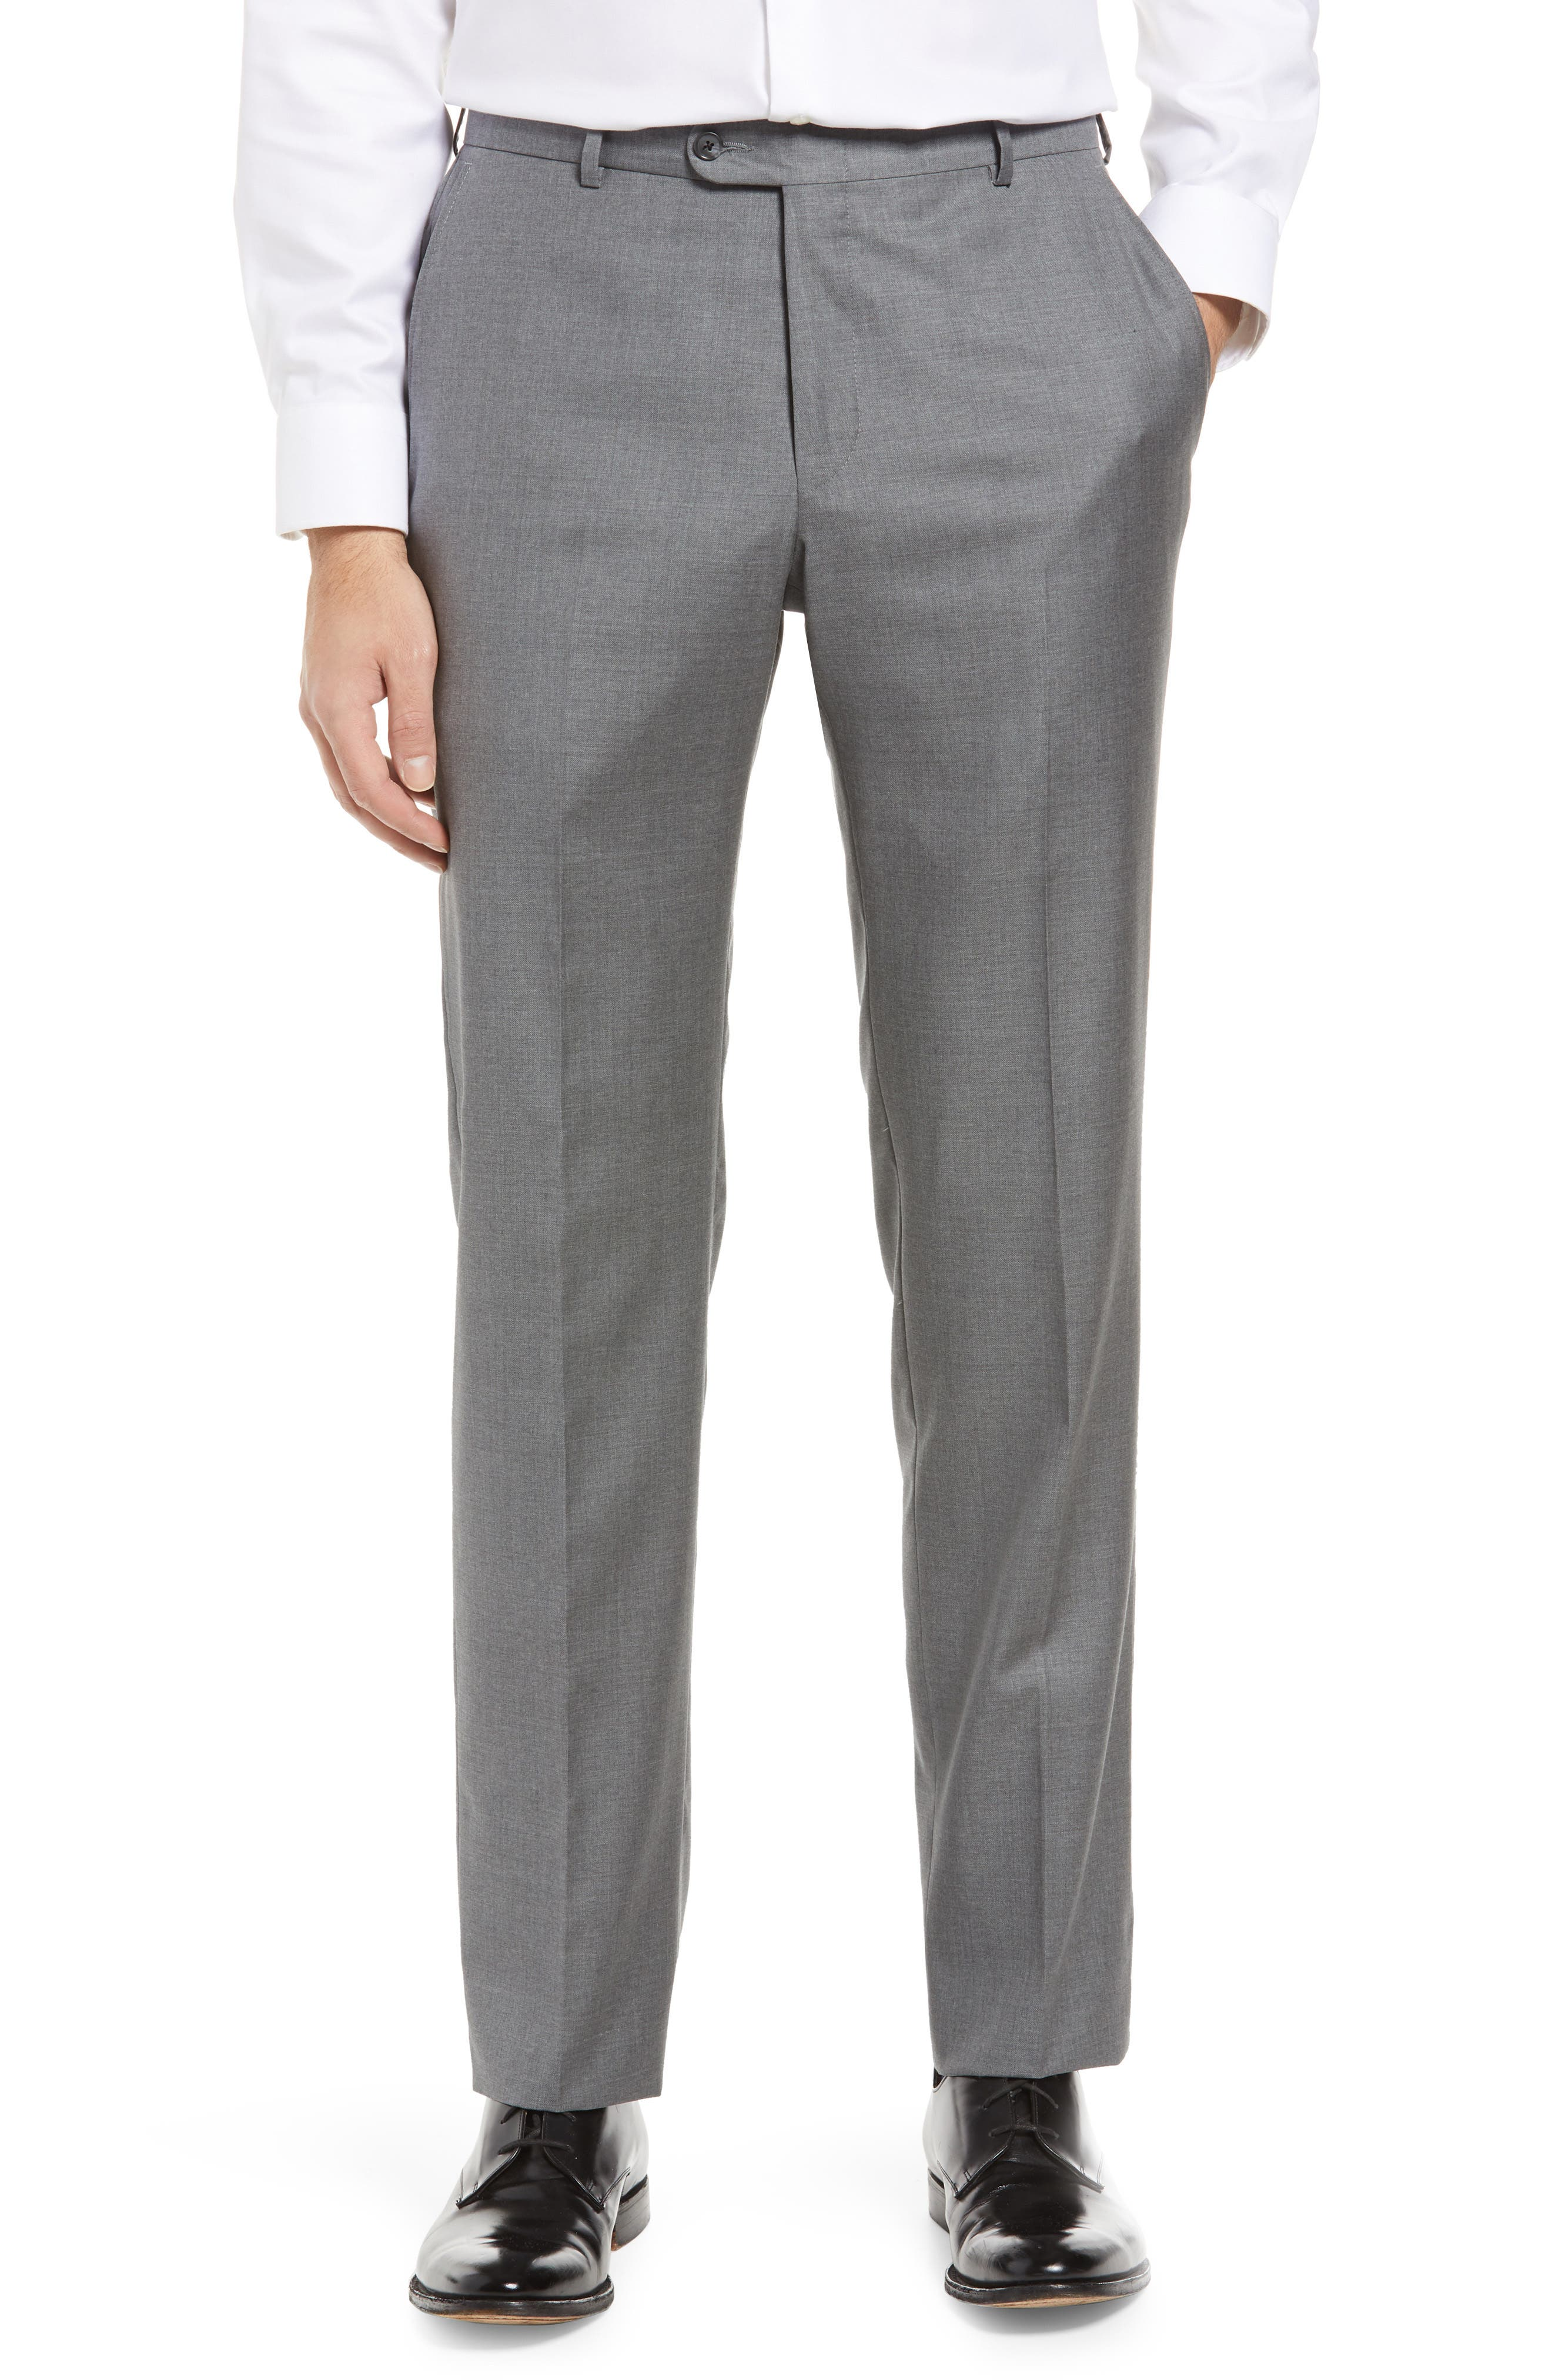 B Series Honeyway Relaxed Fit Dress Pants